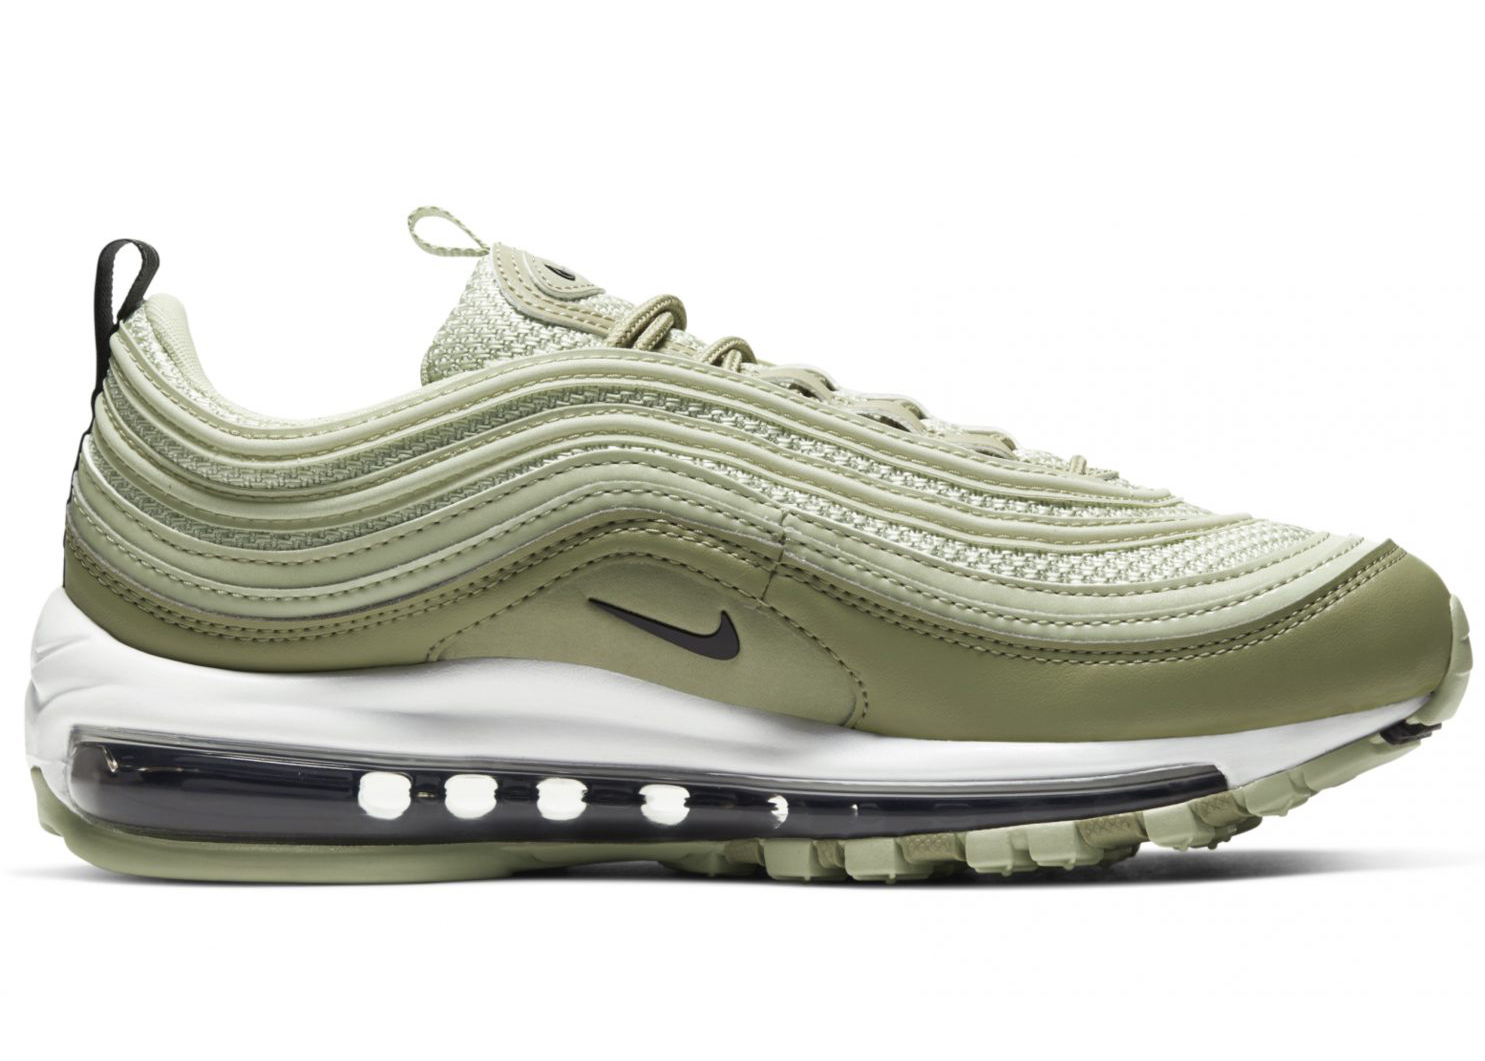 Nike Air Max 97 Olive Aura (W)